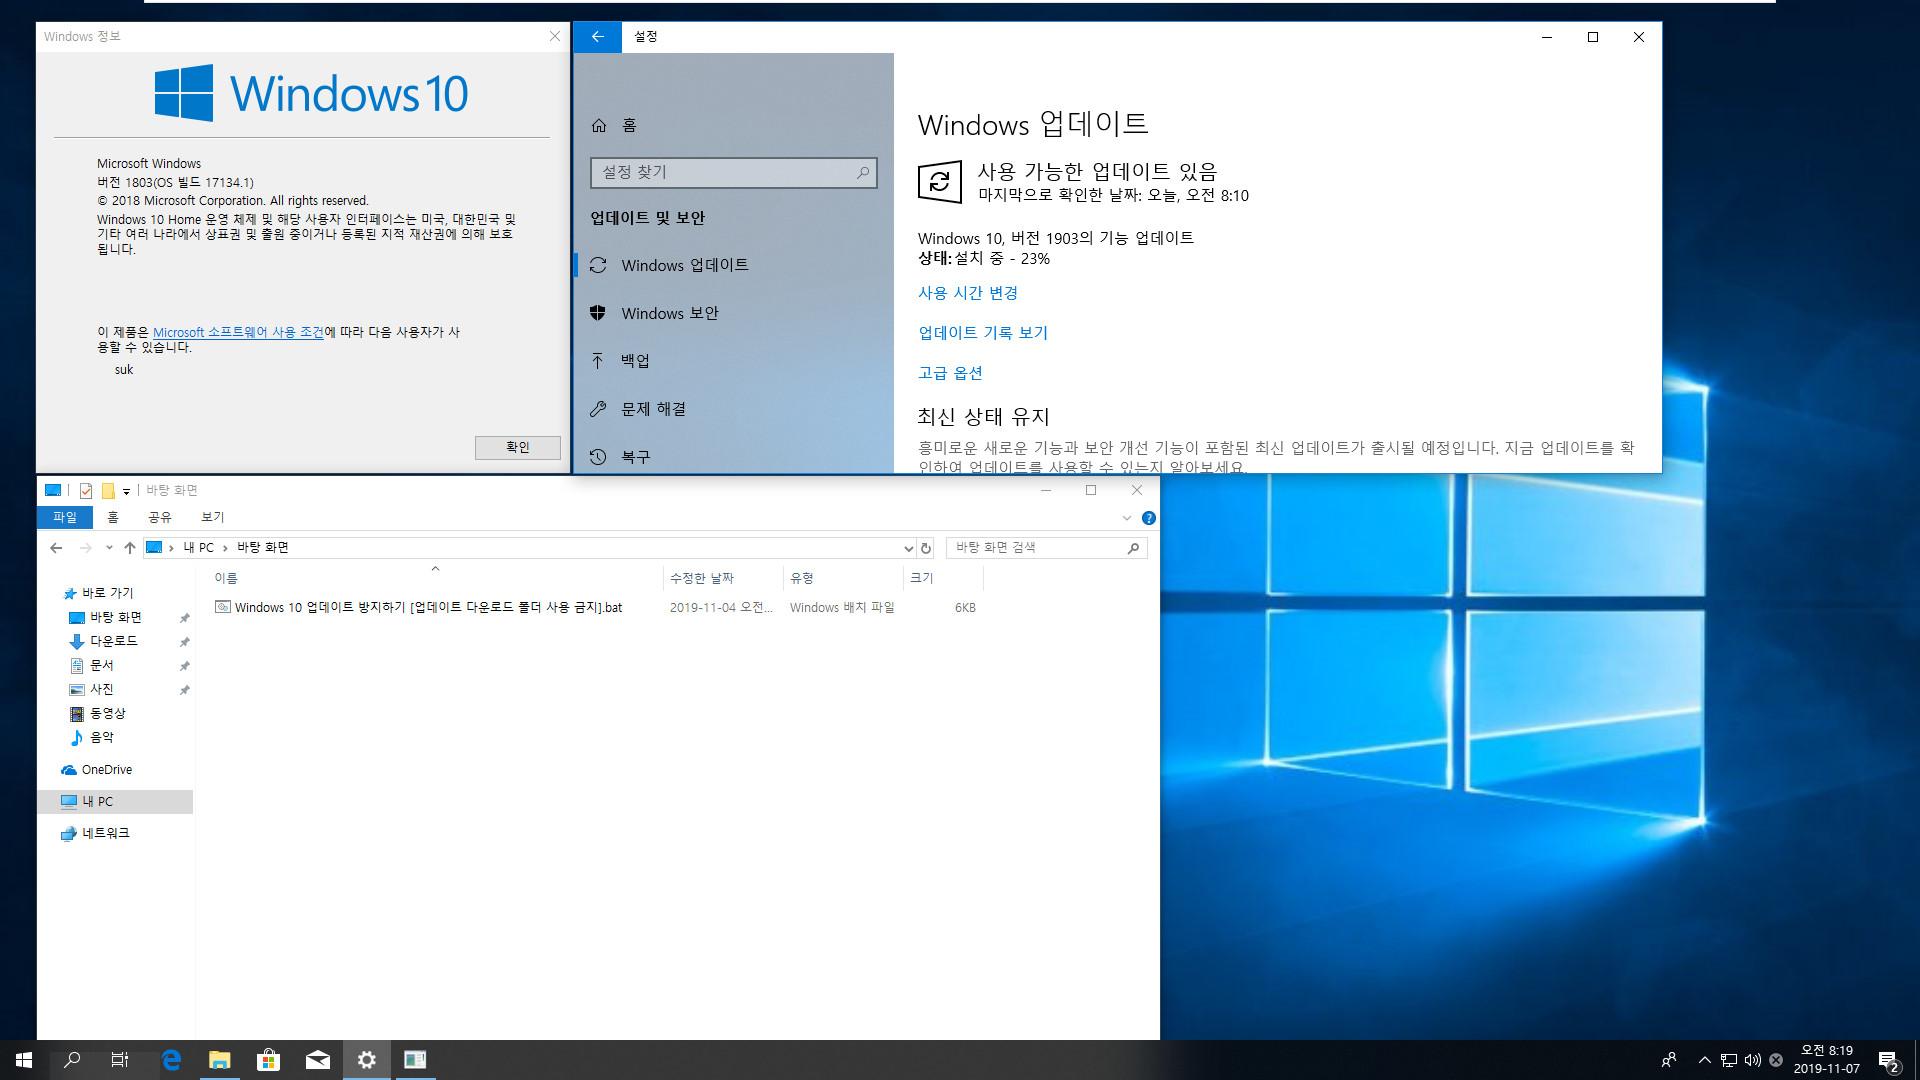 Windows 10 업데이트 방지하기 [업데이트 다운로드 폴더 사용 금지].bat 테스트 - 버전 1803, Home 에서 버전 1903 기능 업데이트 방지하기 2019-11-07_081949.jpg